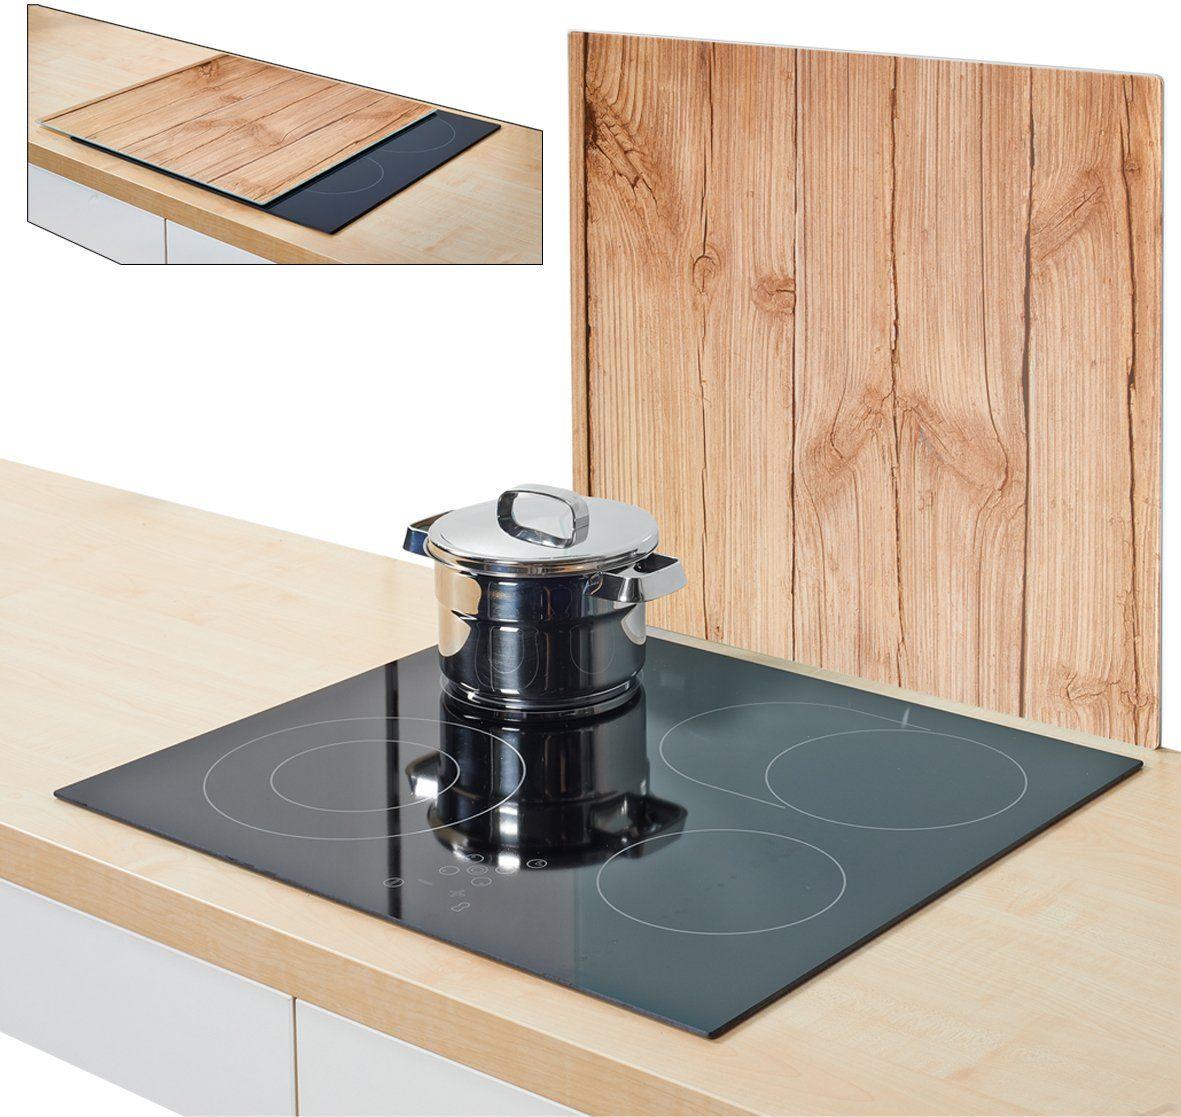 Zeller Present XL-Herdblende-/Abdeckplatte »Wood«, 56 x 50 cm